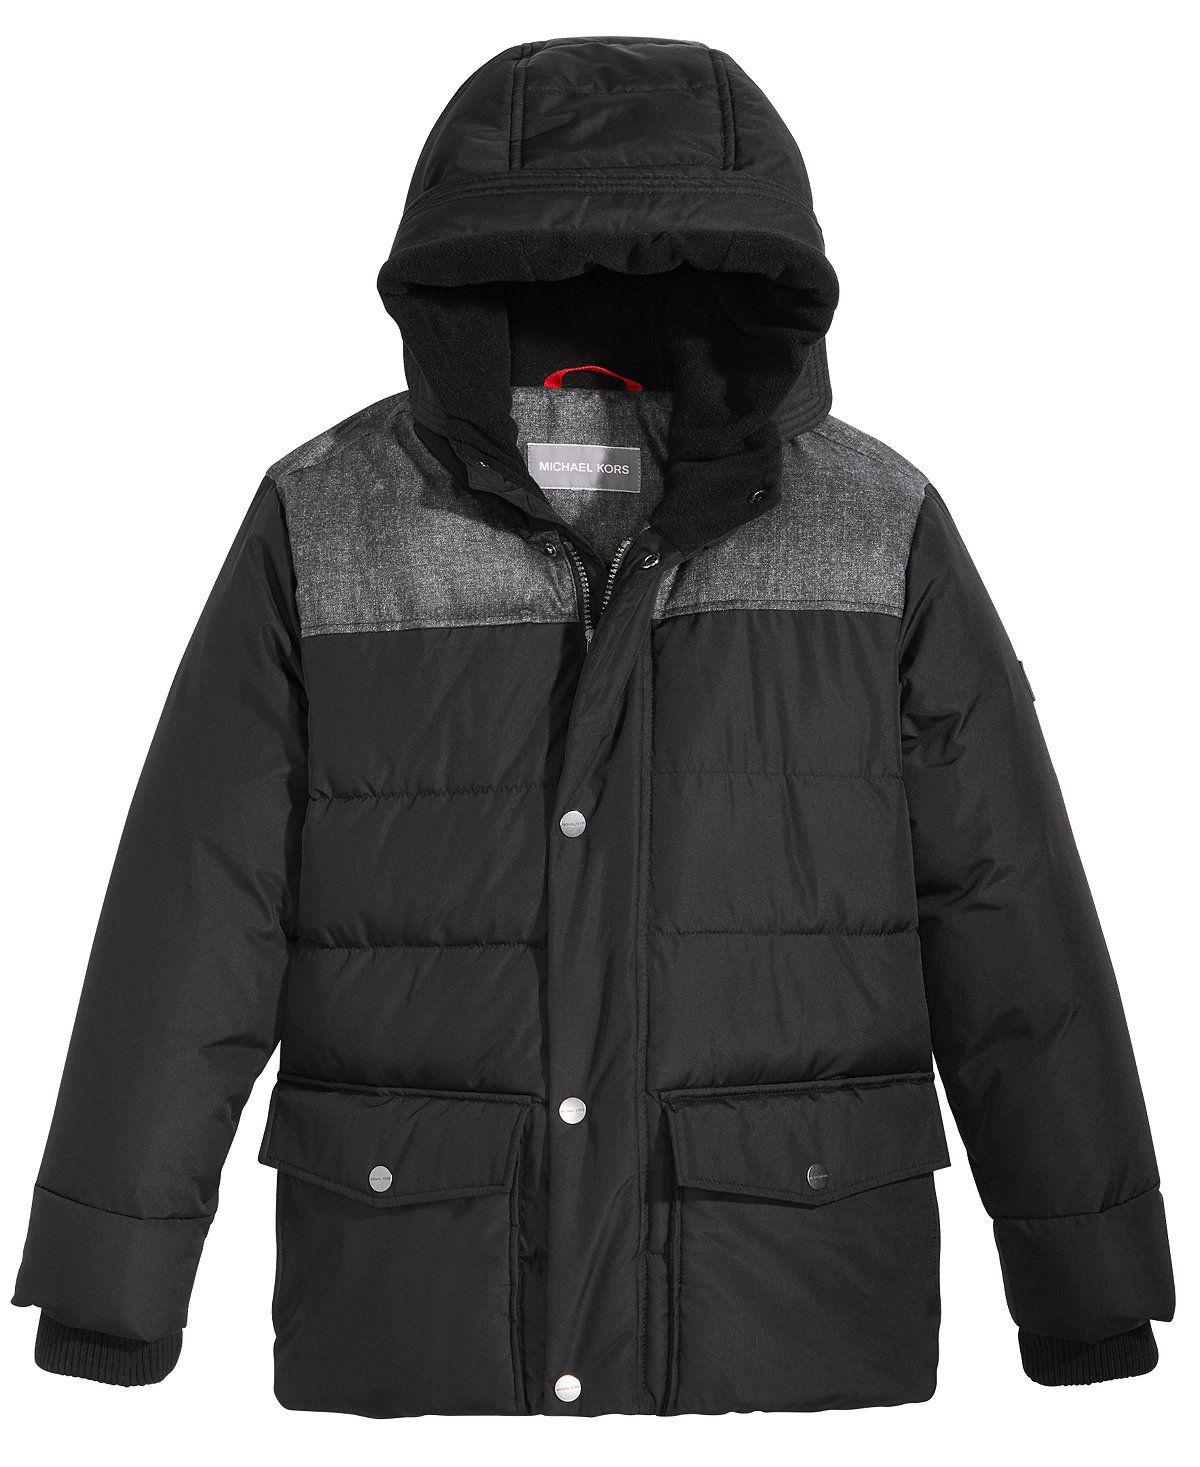 213e5d695 Michael Kors Woolish Hooded Puffer Jacket